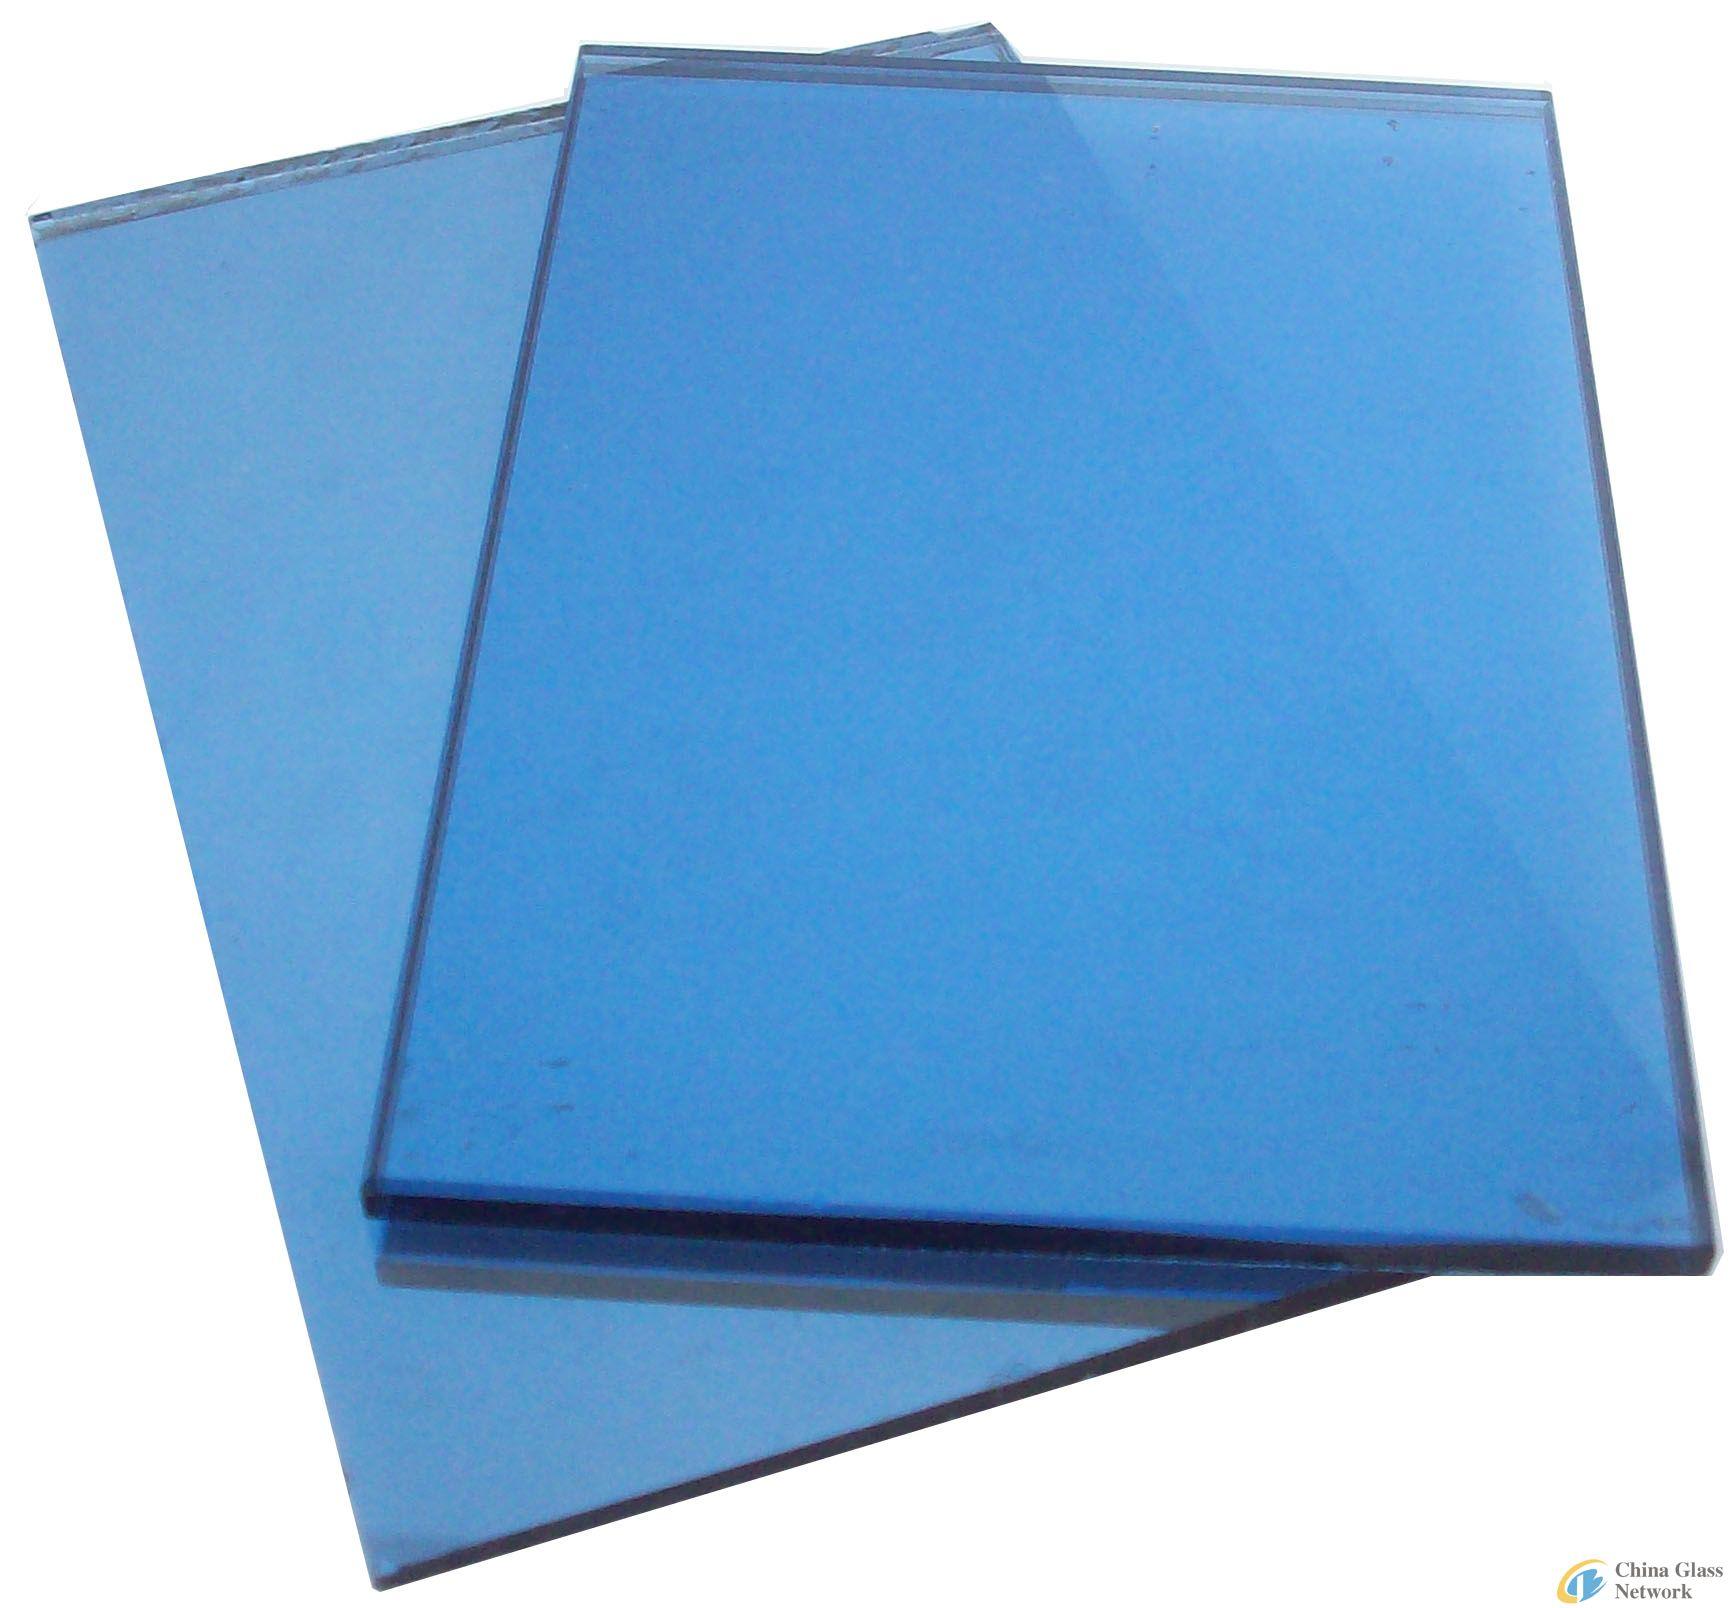 744b1ba31a05 Sell dark blue reflective glass-Reflective Glass-Processed Glass ...